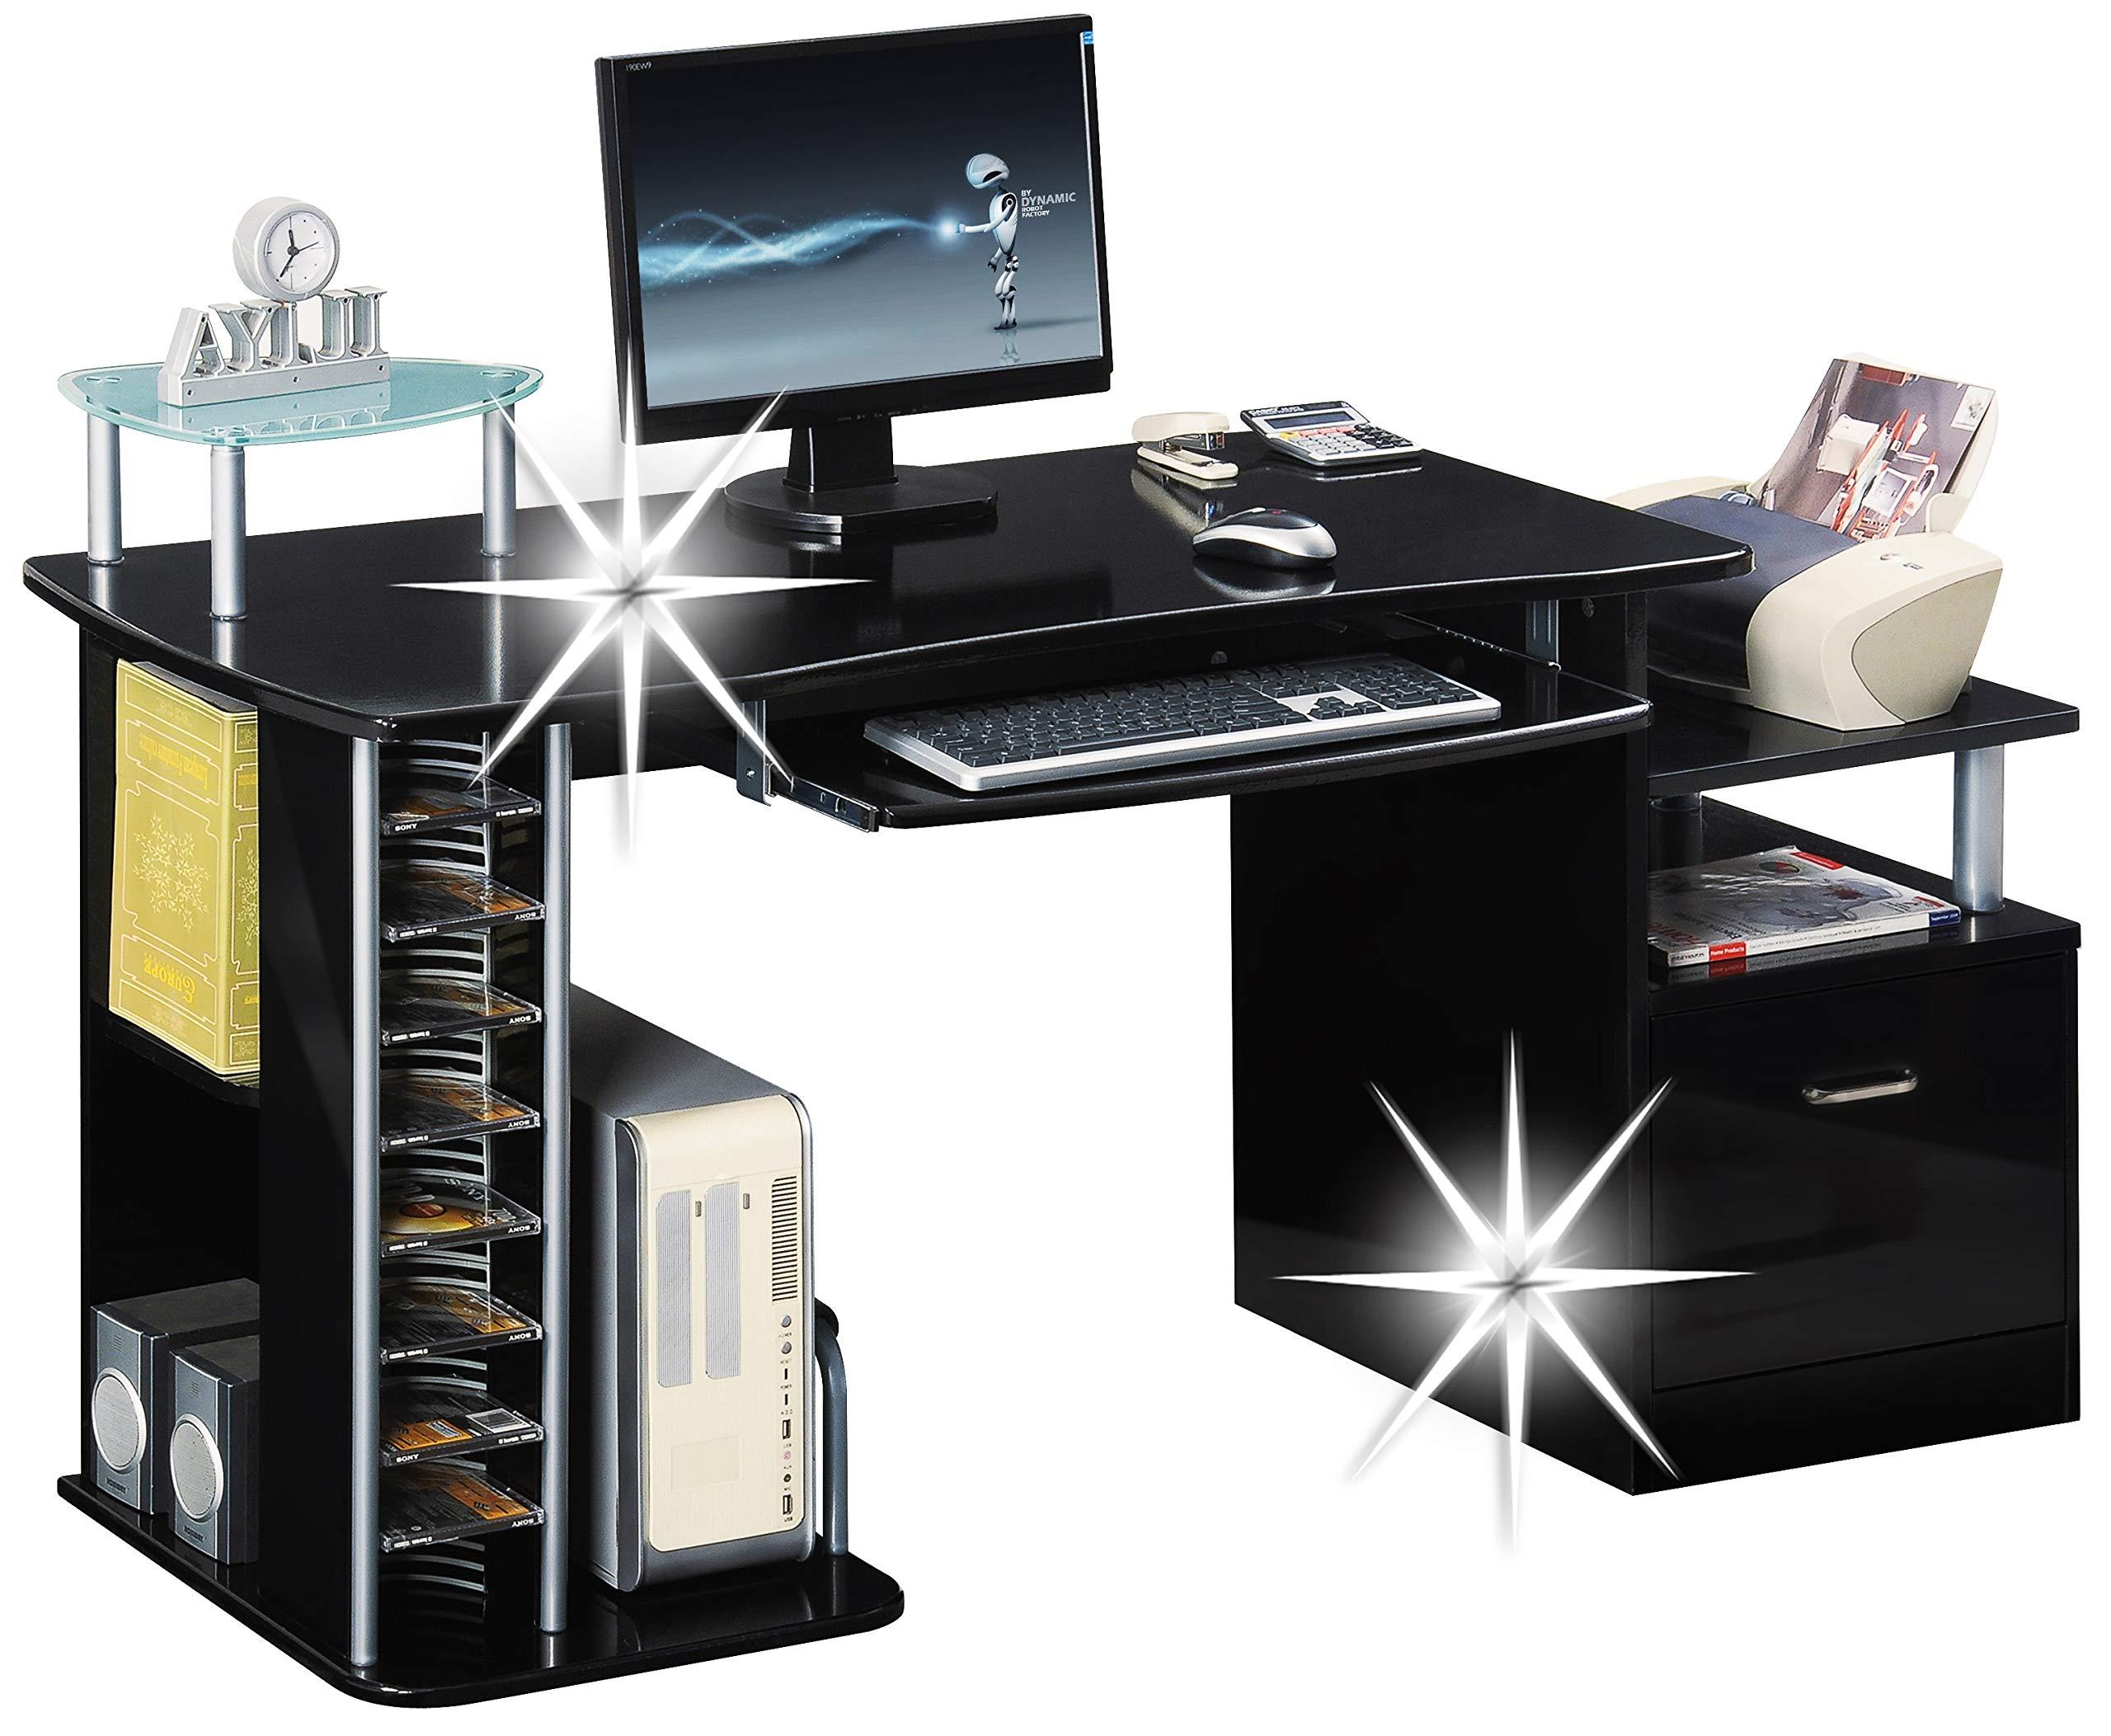 Top meubles de bureau selon les notes amazon.fr